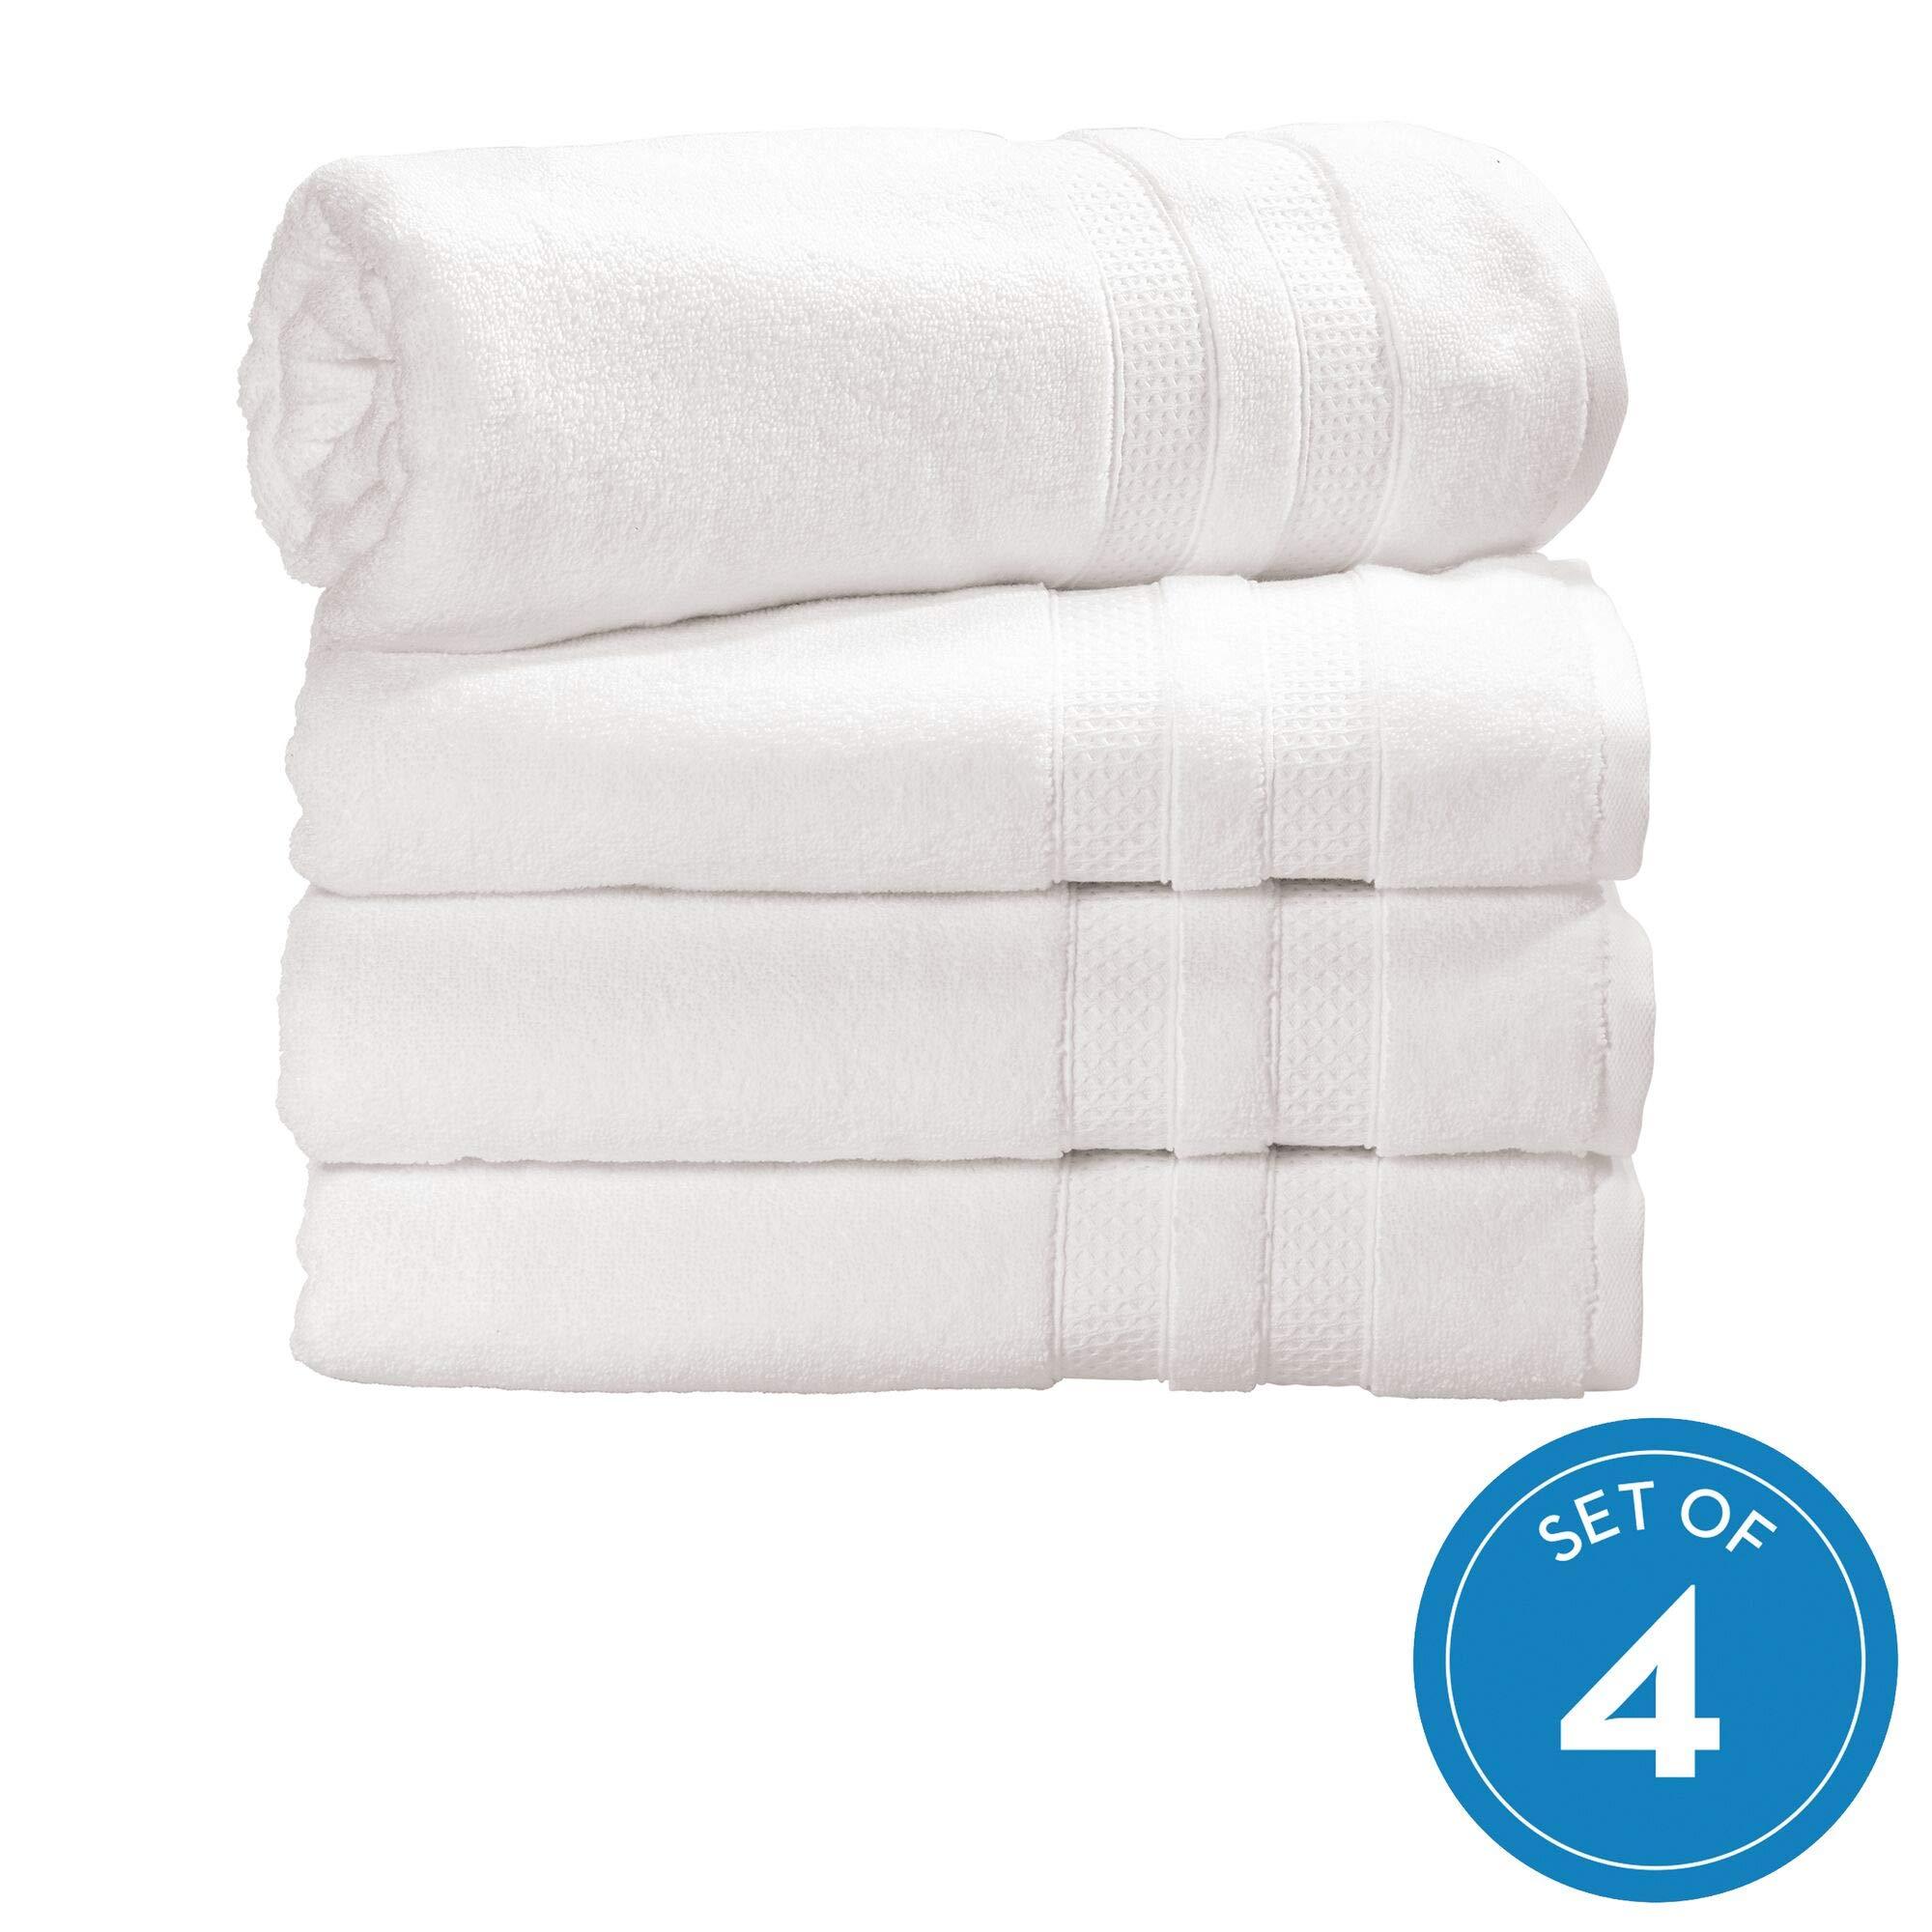 iDesign Spa Bath Hanging Loop, 100% Cotton Soft Absorbent Machine Washable Body Towel for Bathroom, Gym, Shower, Tub, Pool, Set of 4, White